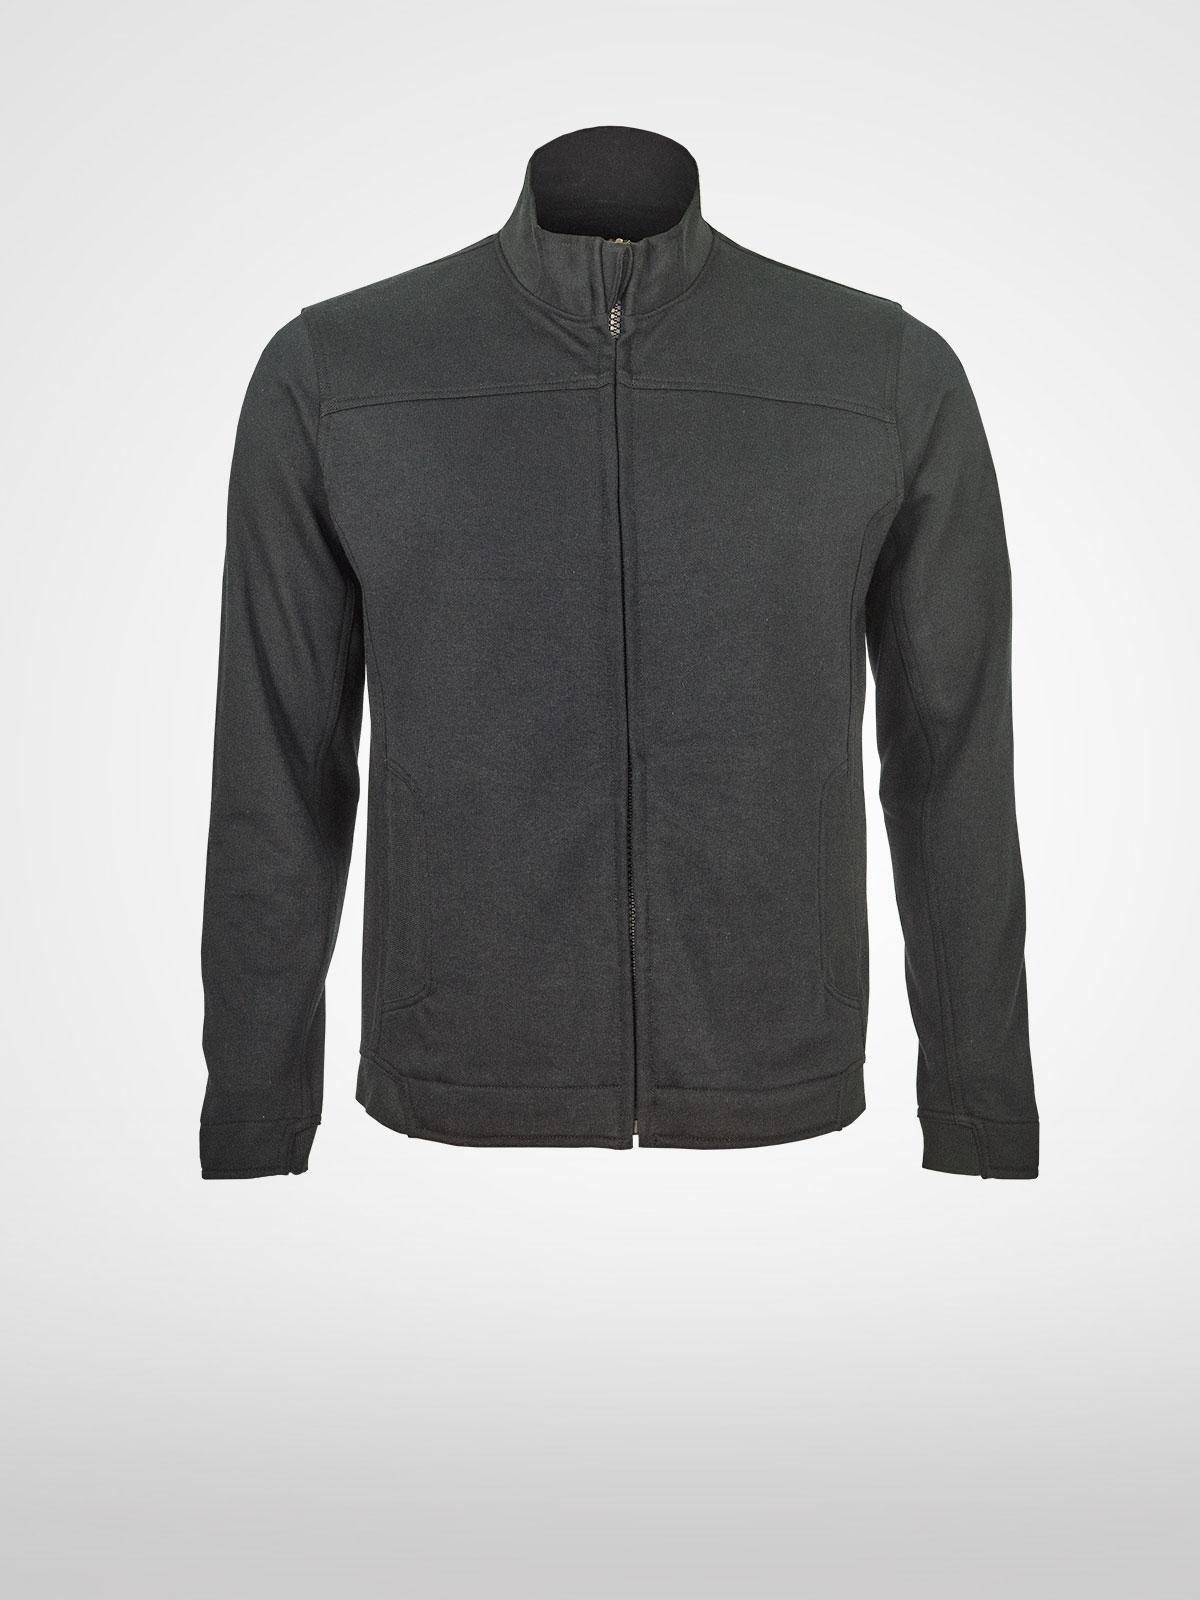 ac628c703523 Flame Resistant Fleece Jackets